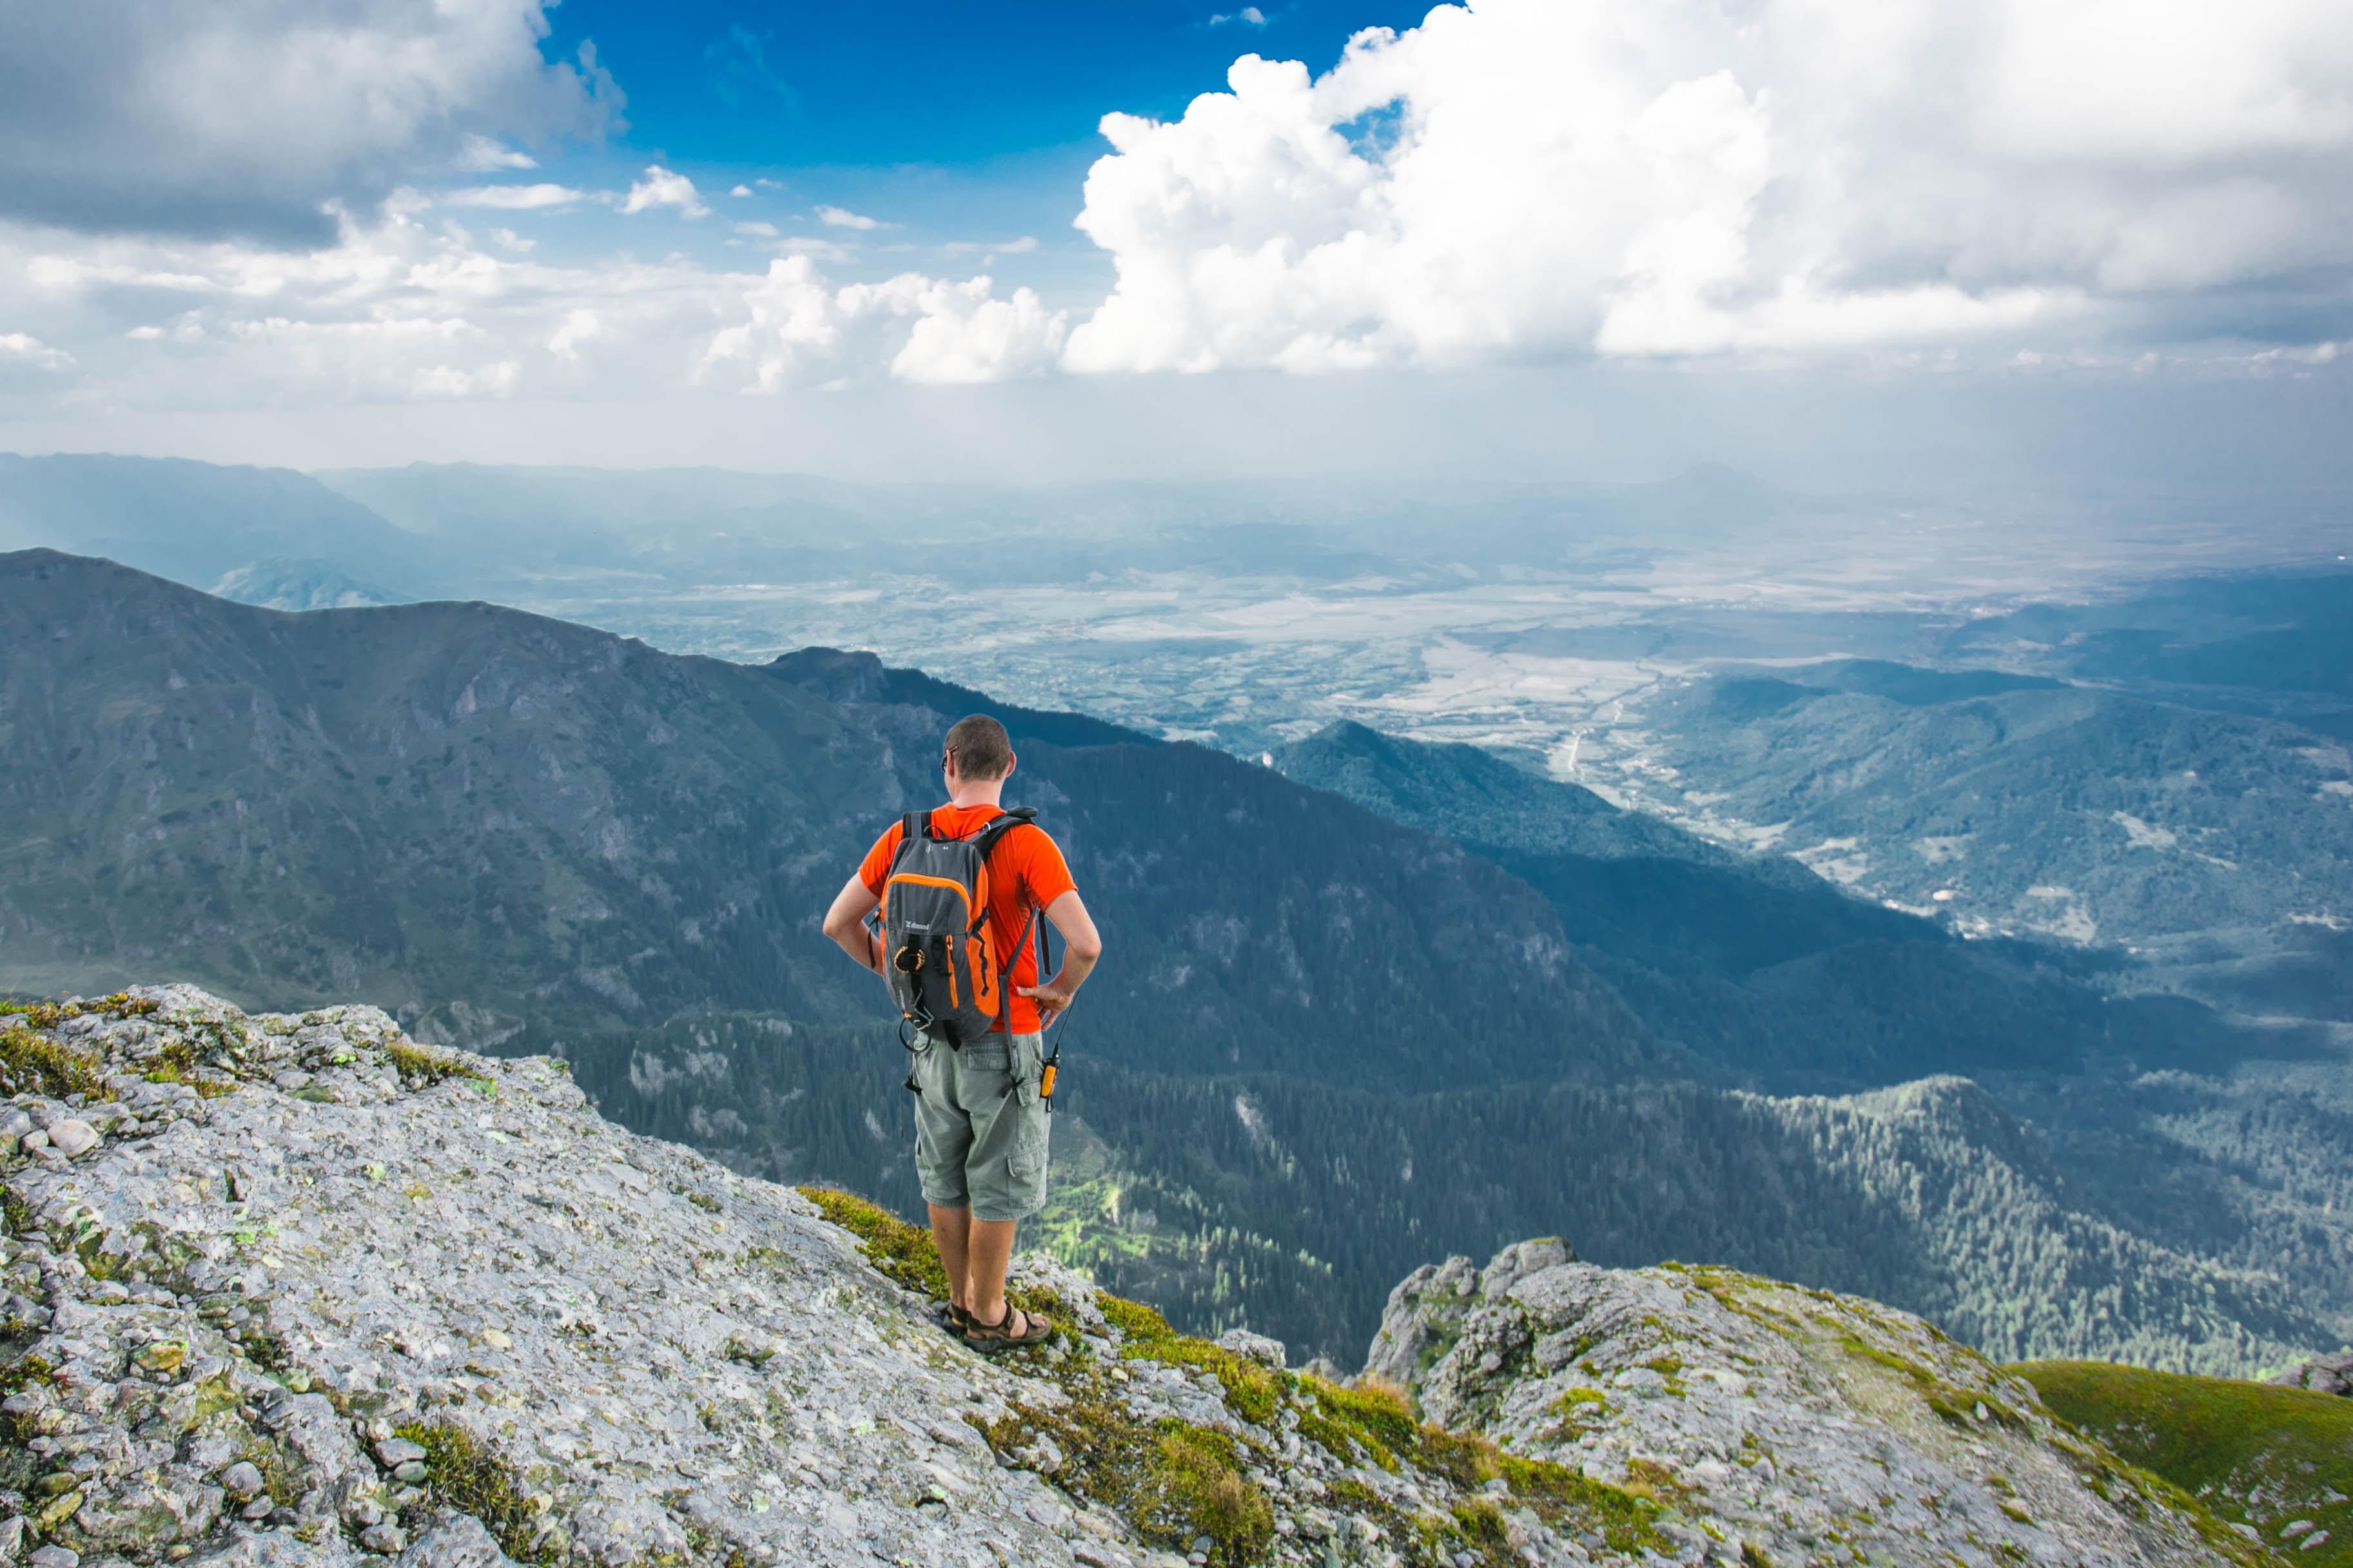 man standing on peak front of mountain at daytime